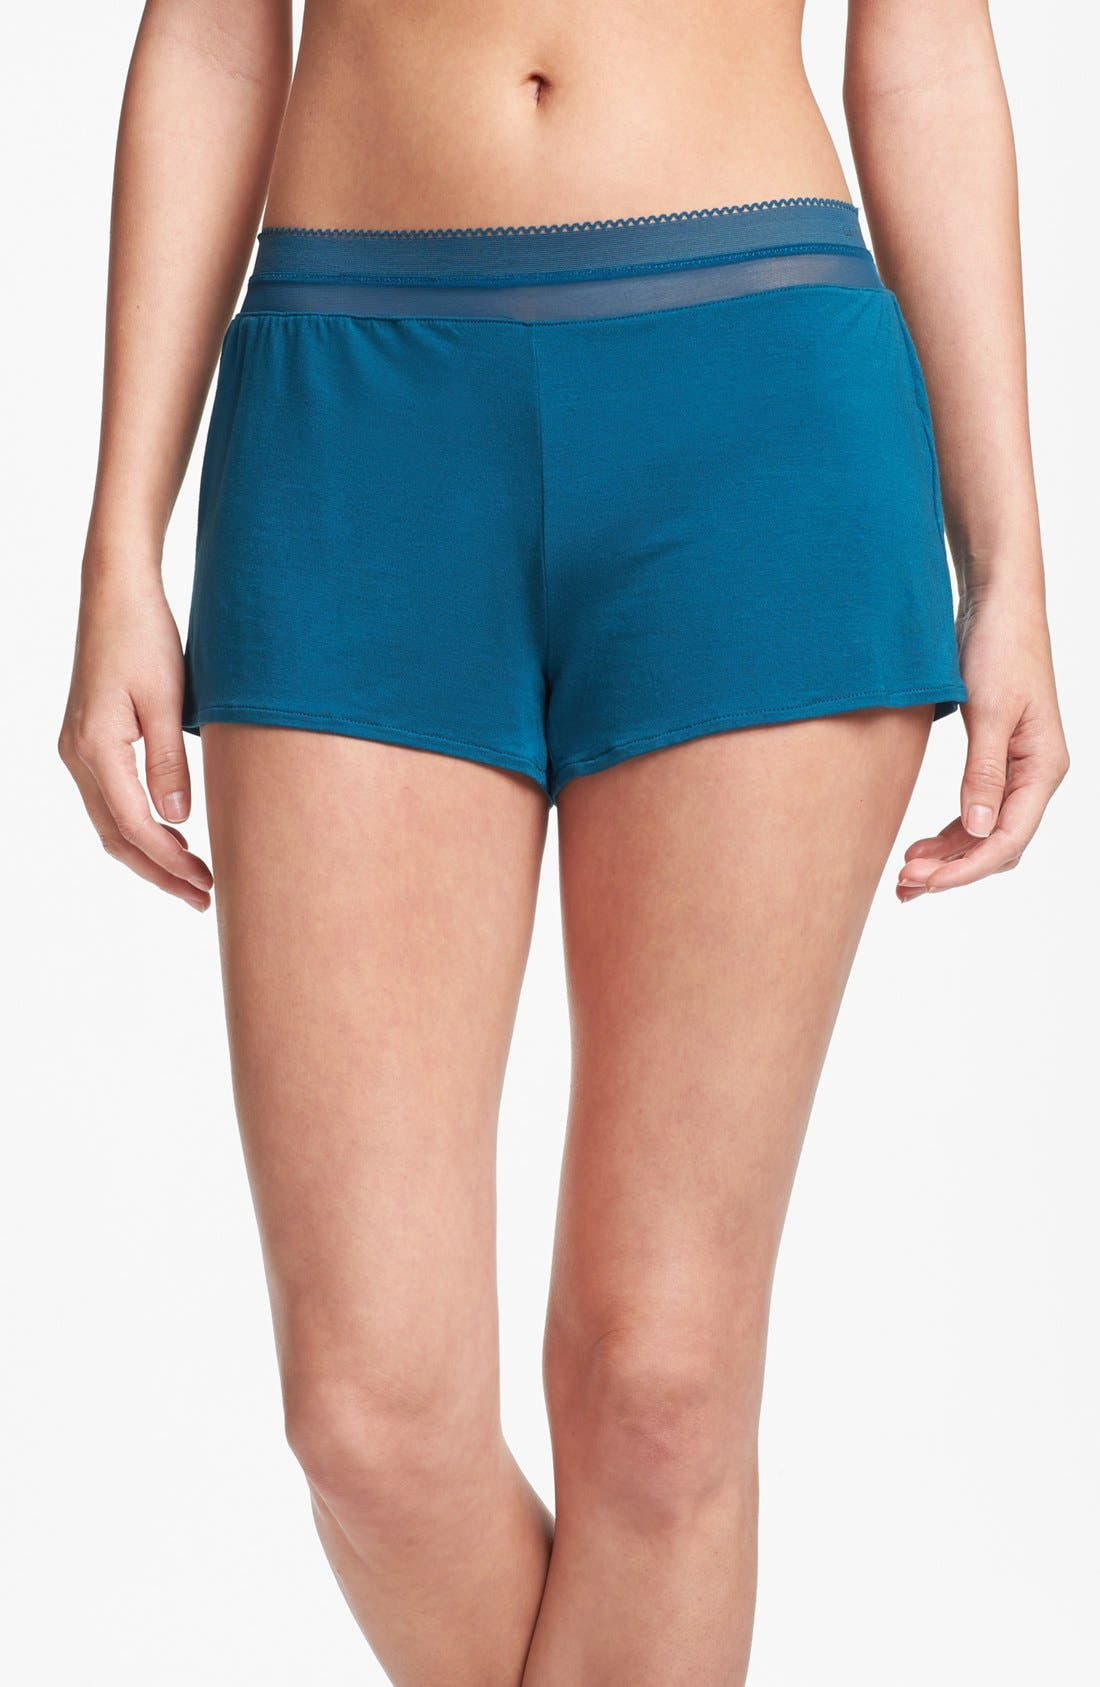 Alternate Image 1 Selected - Calvin Klein 'Icon' Shorts